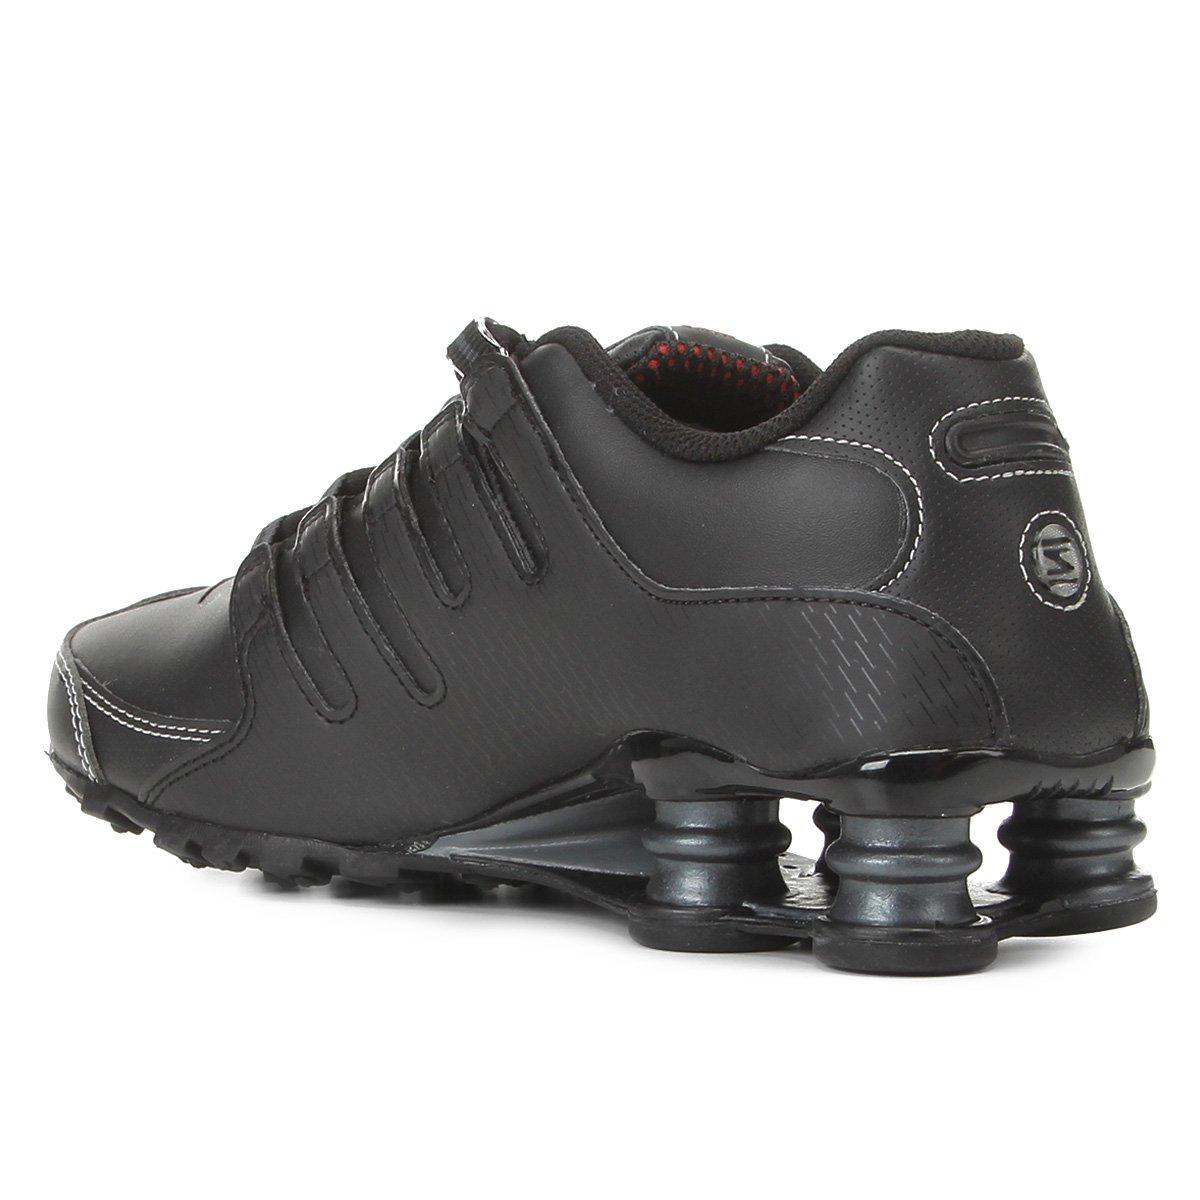 Tênis Nike Shox Nz Masculino - Tam: 42 - 1